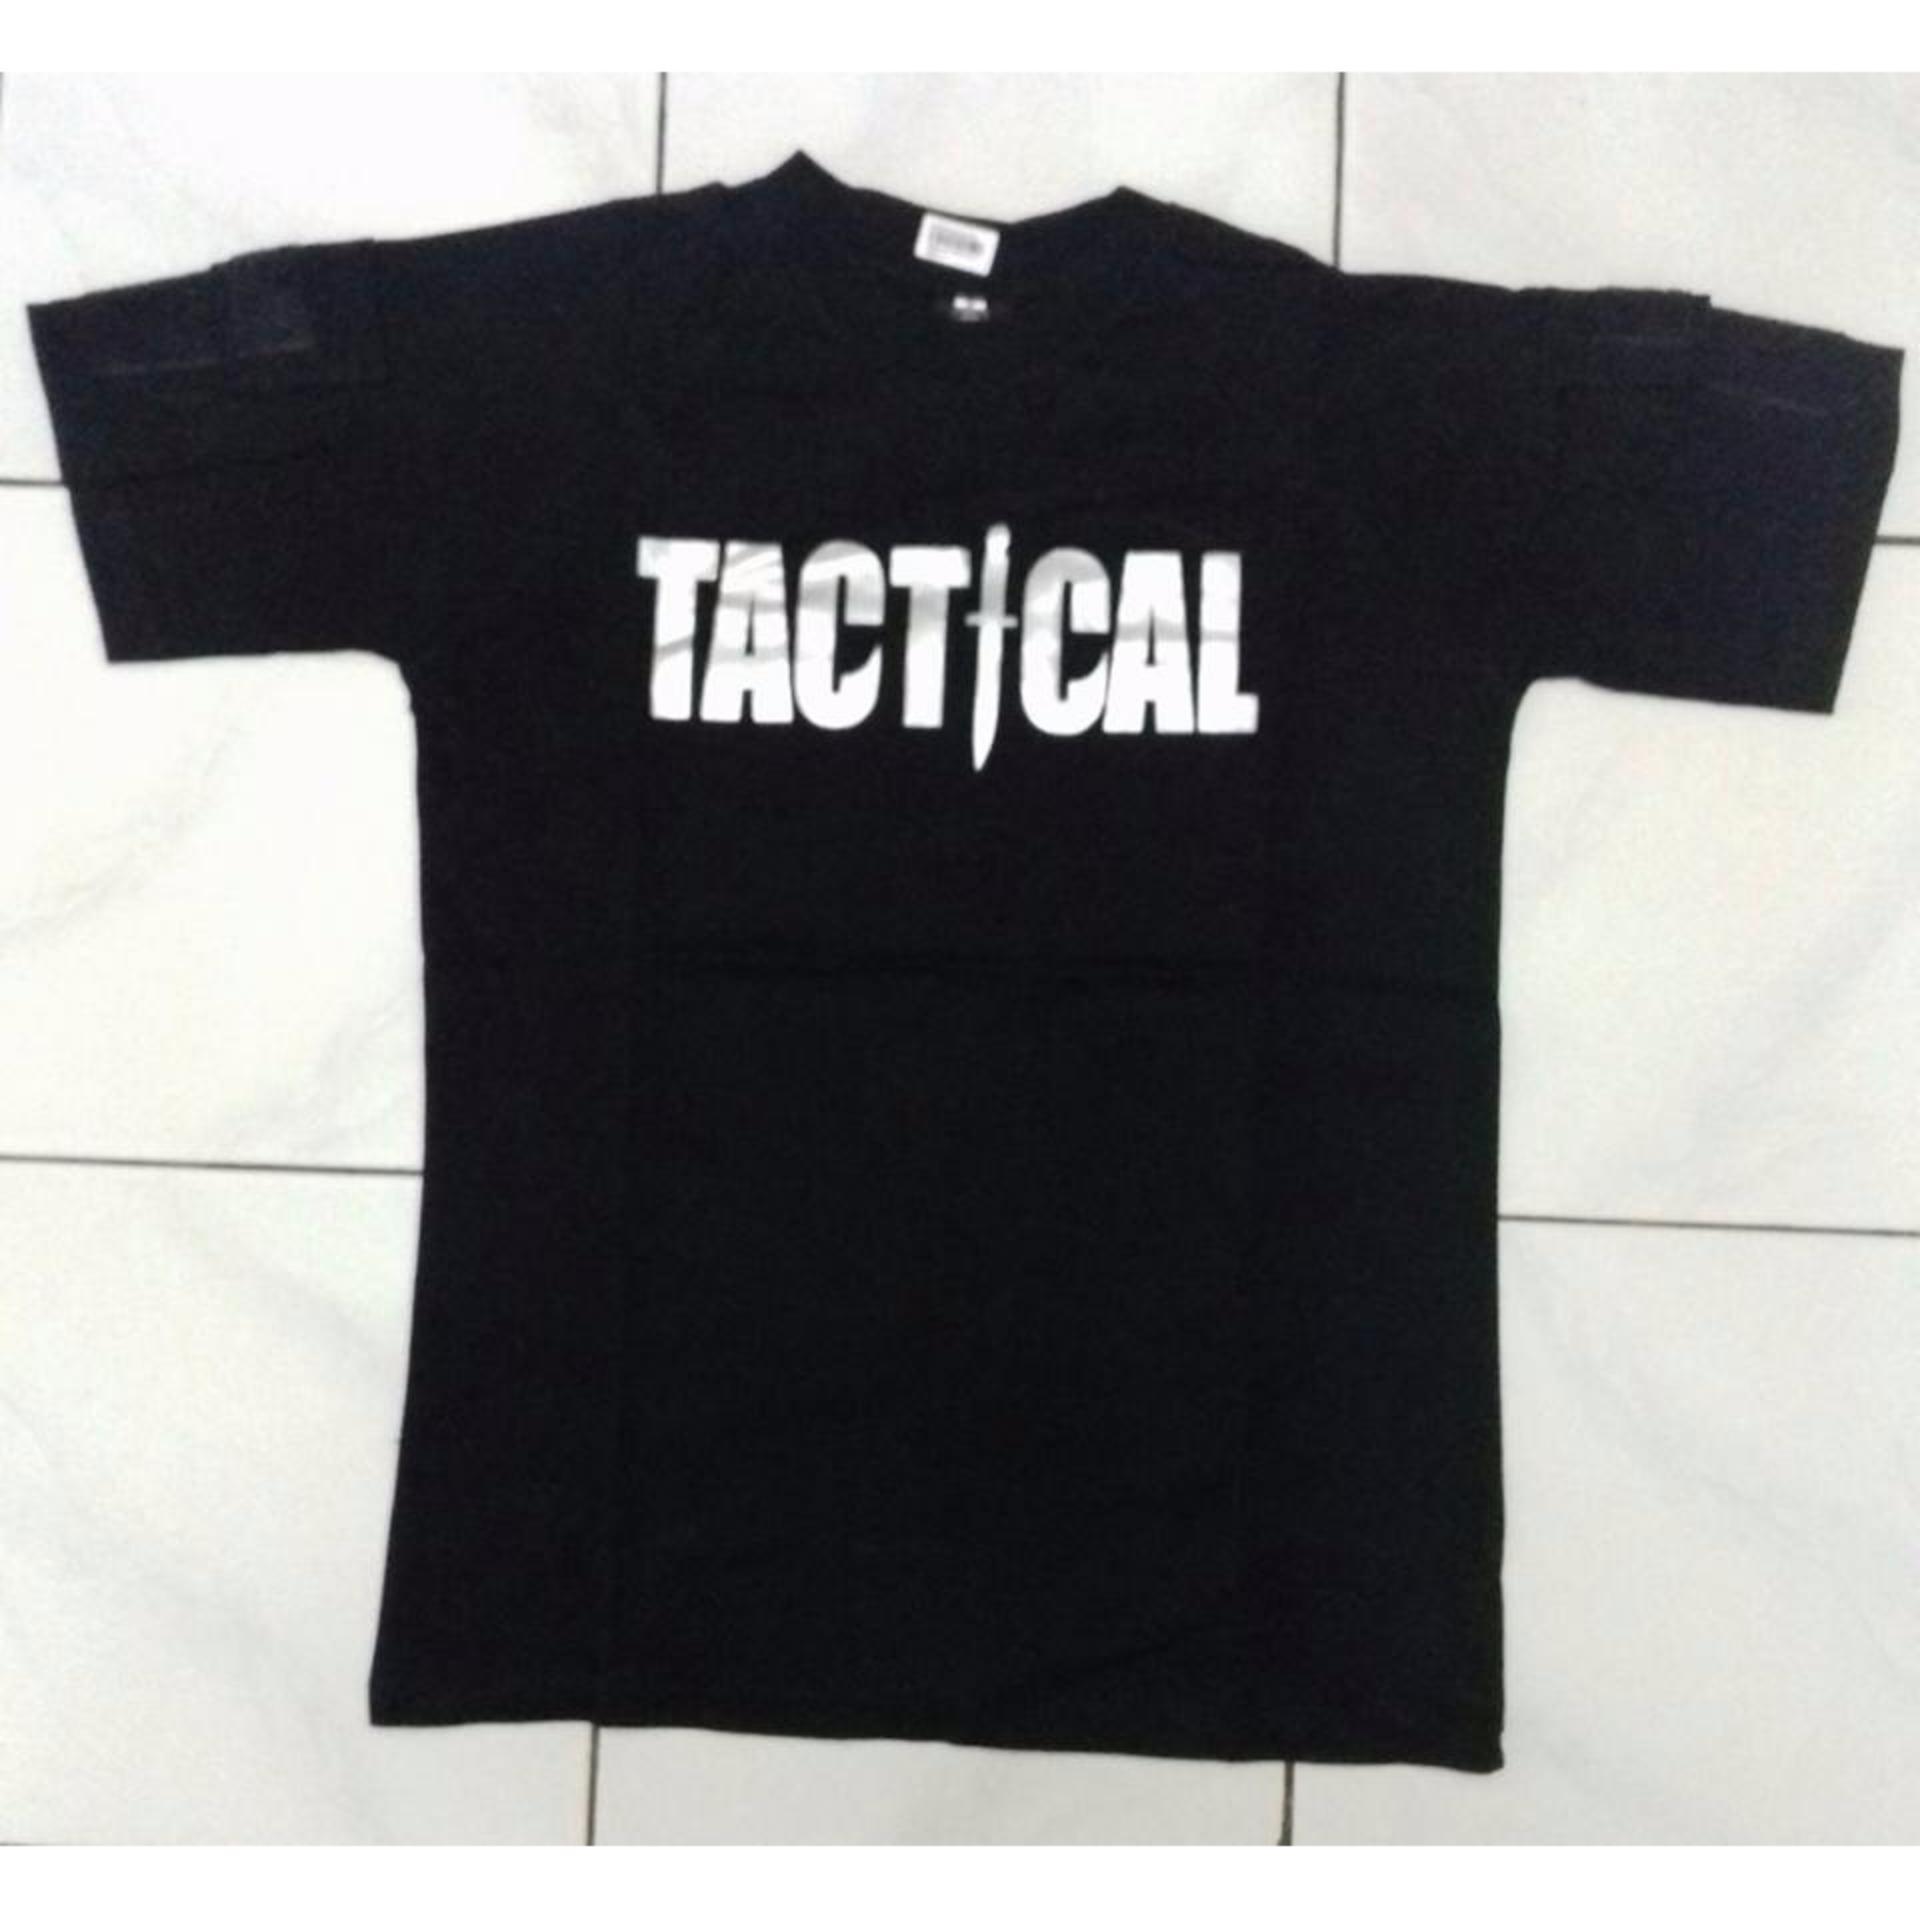 T Shirt Tactical Military Lengan Pendek Merah Hitam Daftar Harga Produk Ukm Bumn Kaos Oblong Pria Xxl